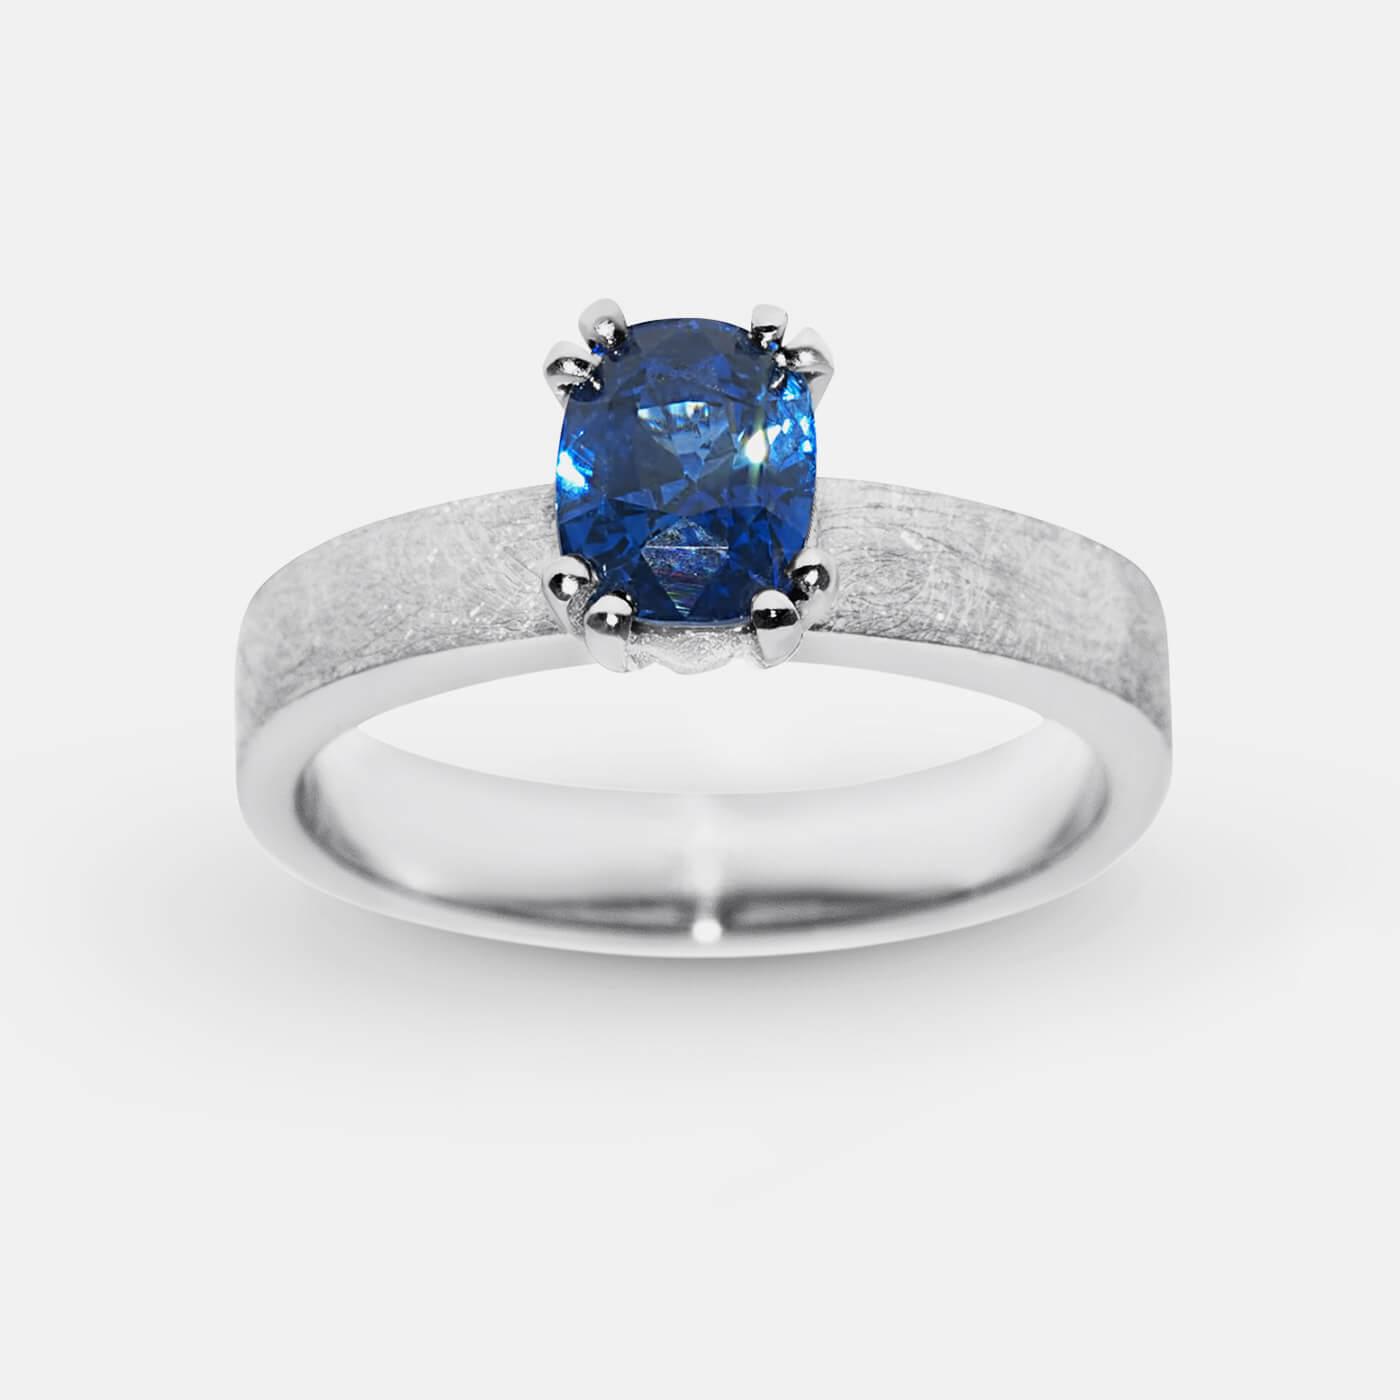 Ceylon Sapphire Solitaire Ring